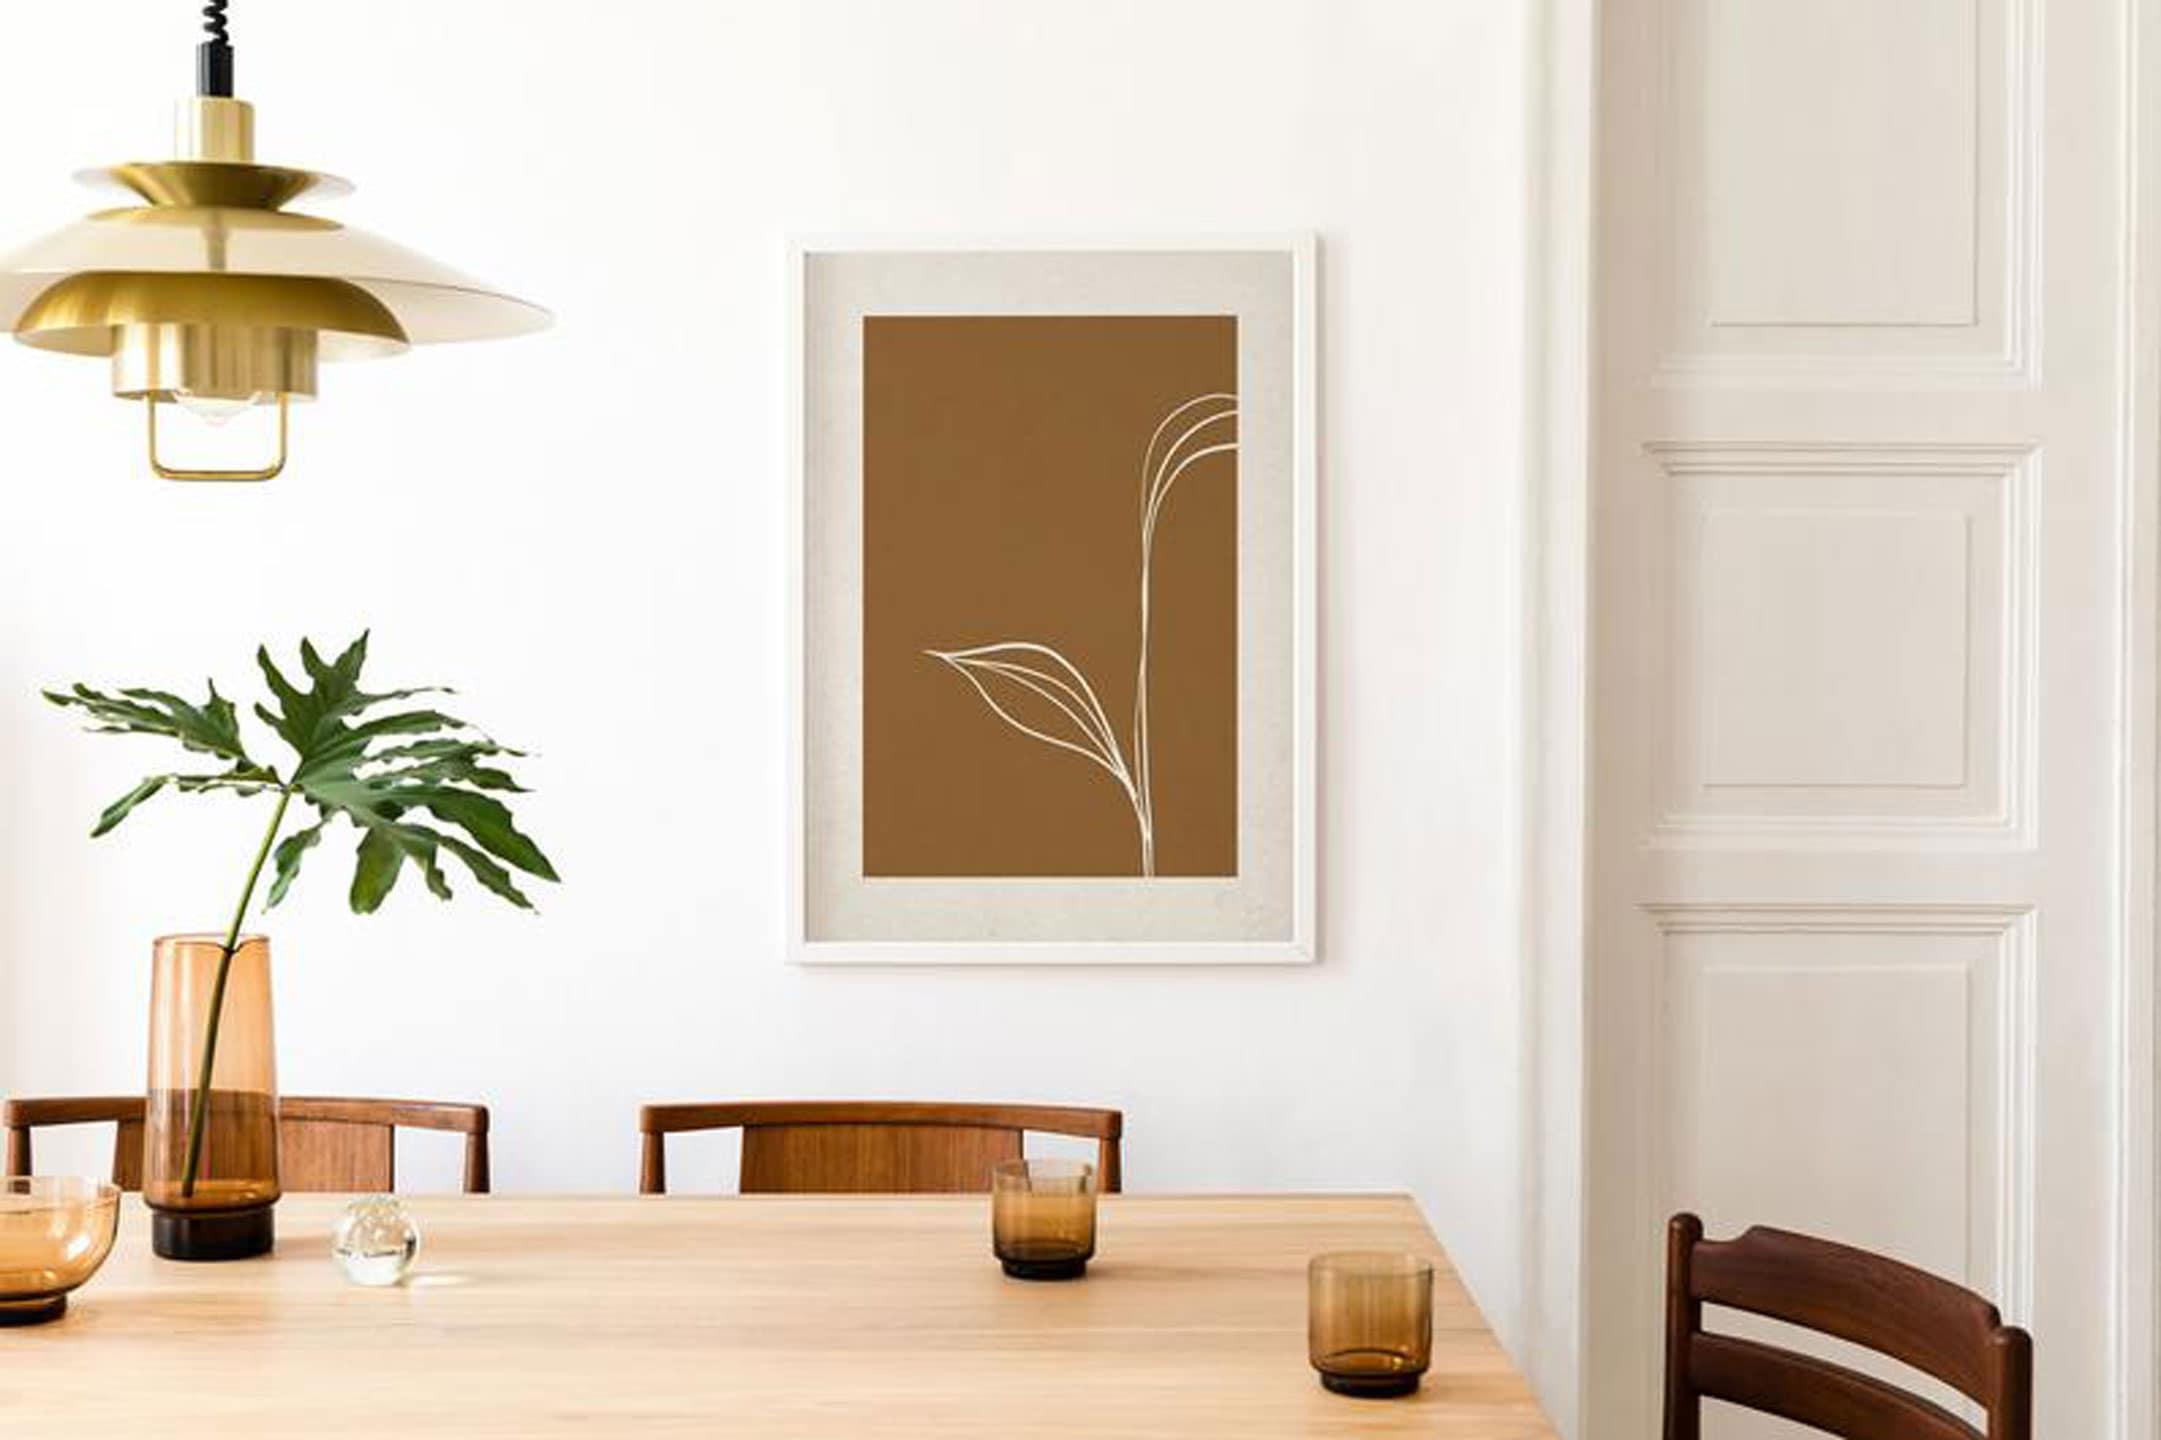 Lifestyle blogger Annie Diamond shares downloadable art from Avenue Print Studio.